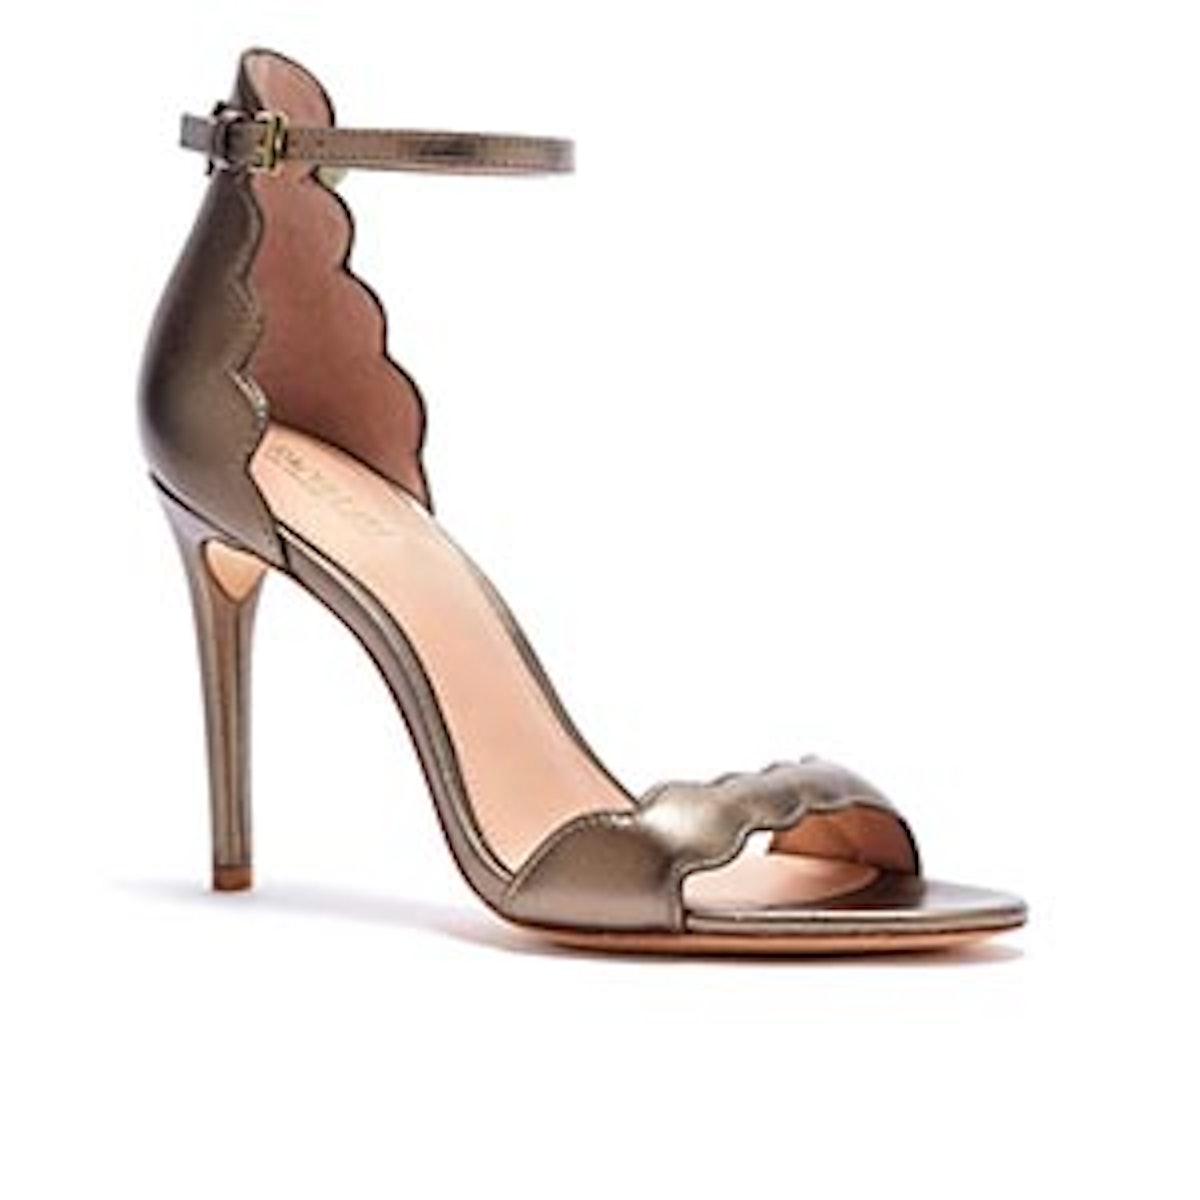 Ava Scalloped Metallic Leather Heeled Sandals